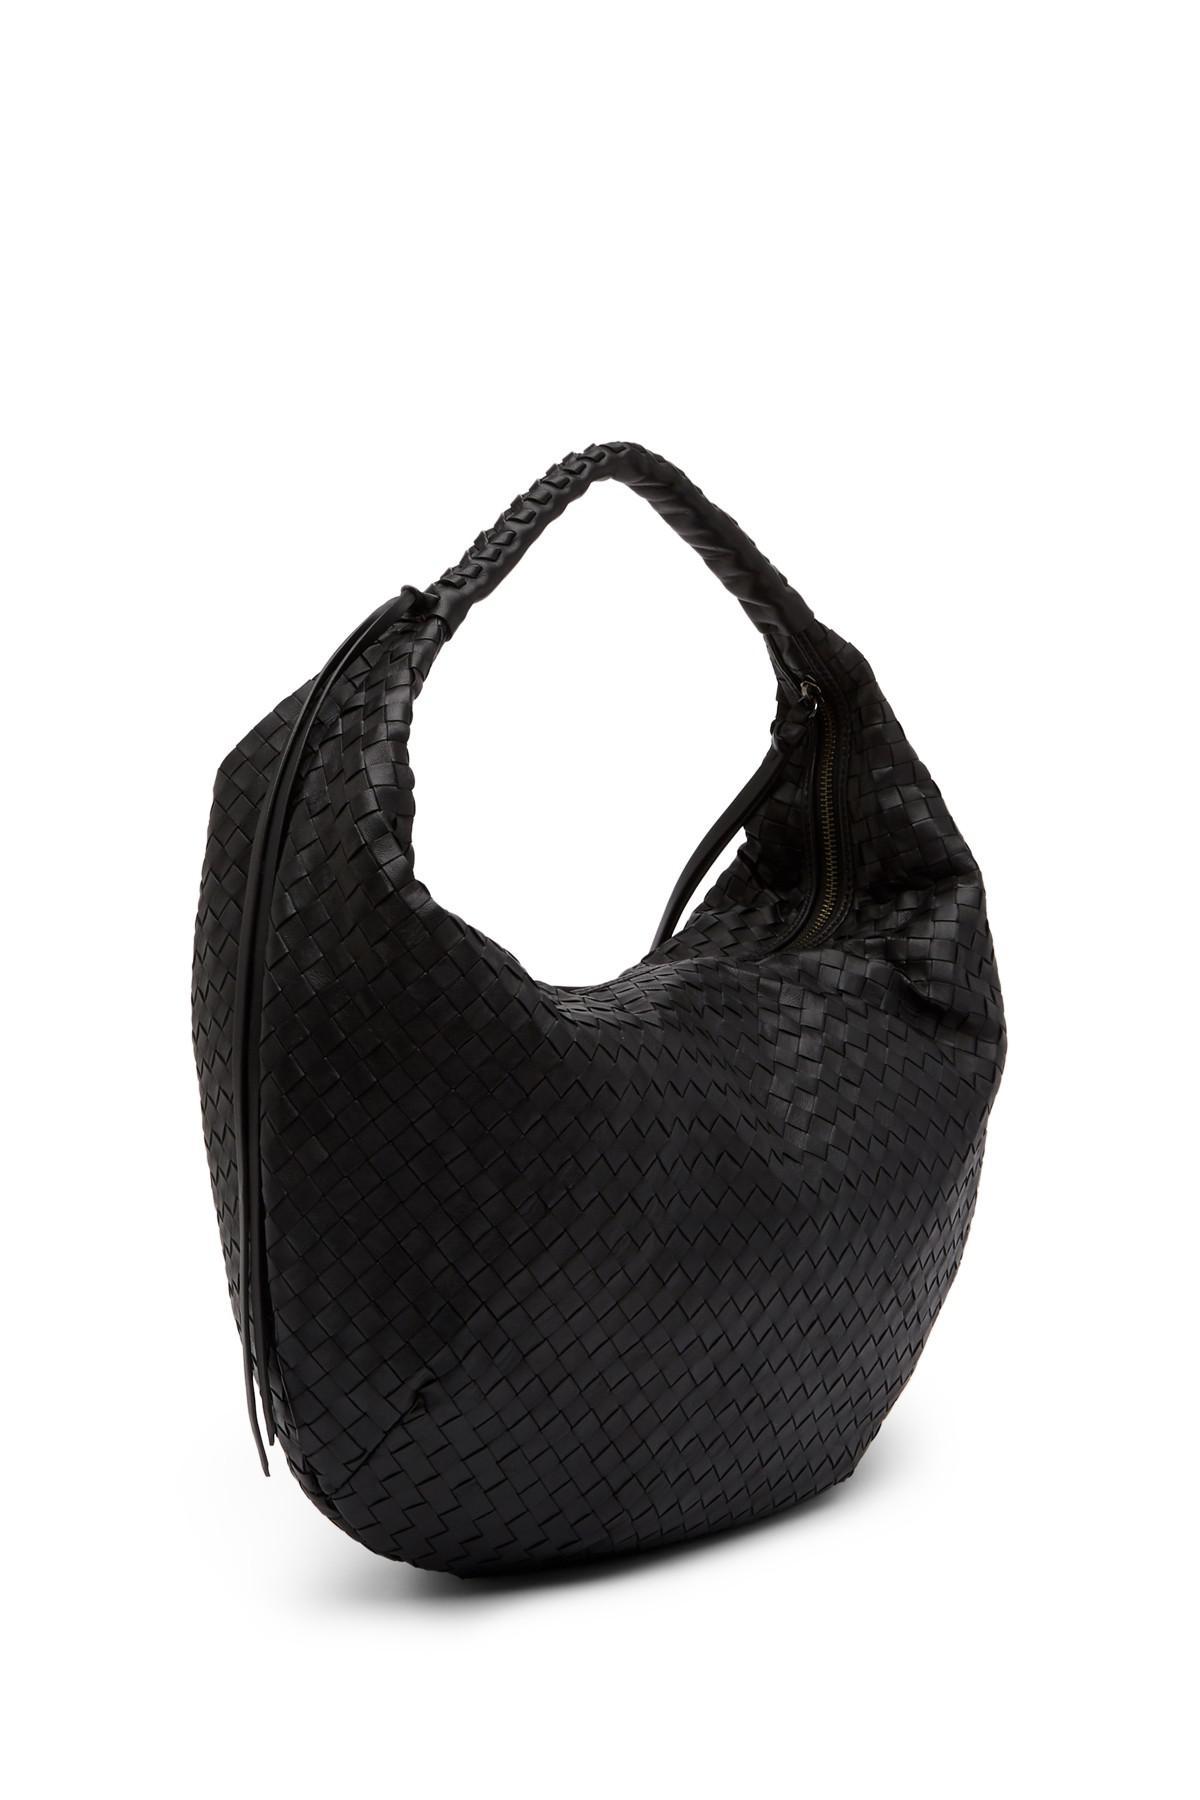 fa90d1f9f65 ... Christopher Kon Woven Leather Hobo Bag in Black - Lyst the best  attitude 4d612 86d73  Christopher Kon Shoulder ...